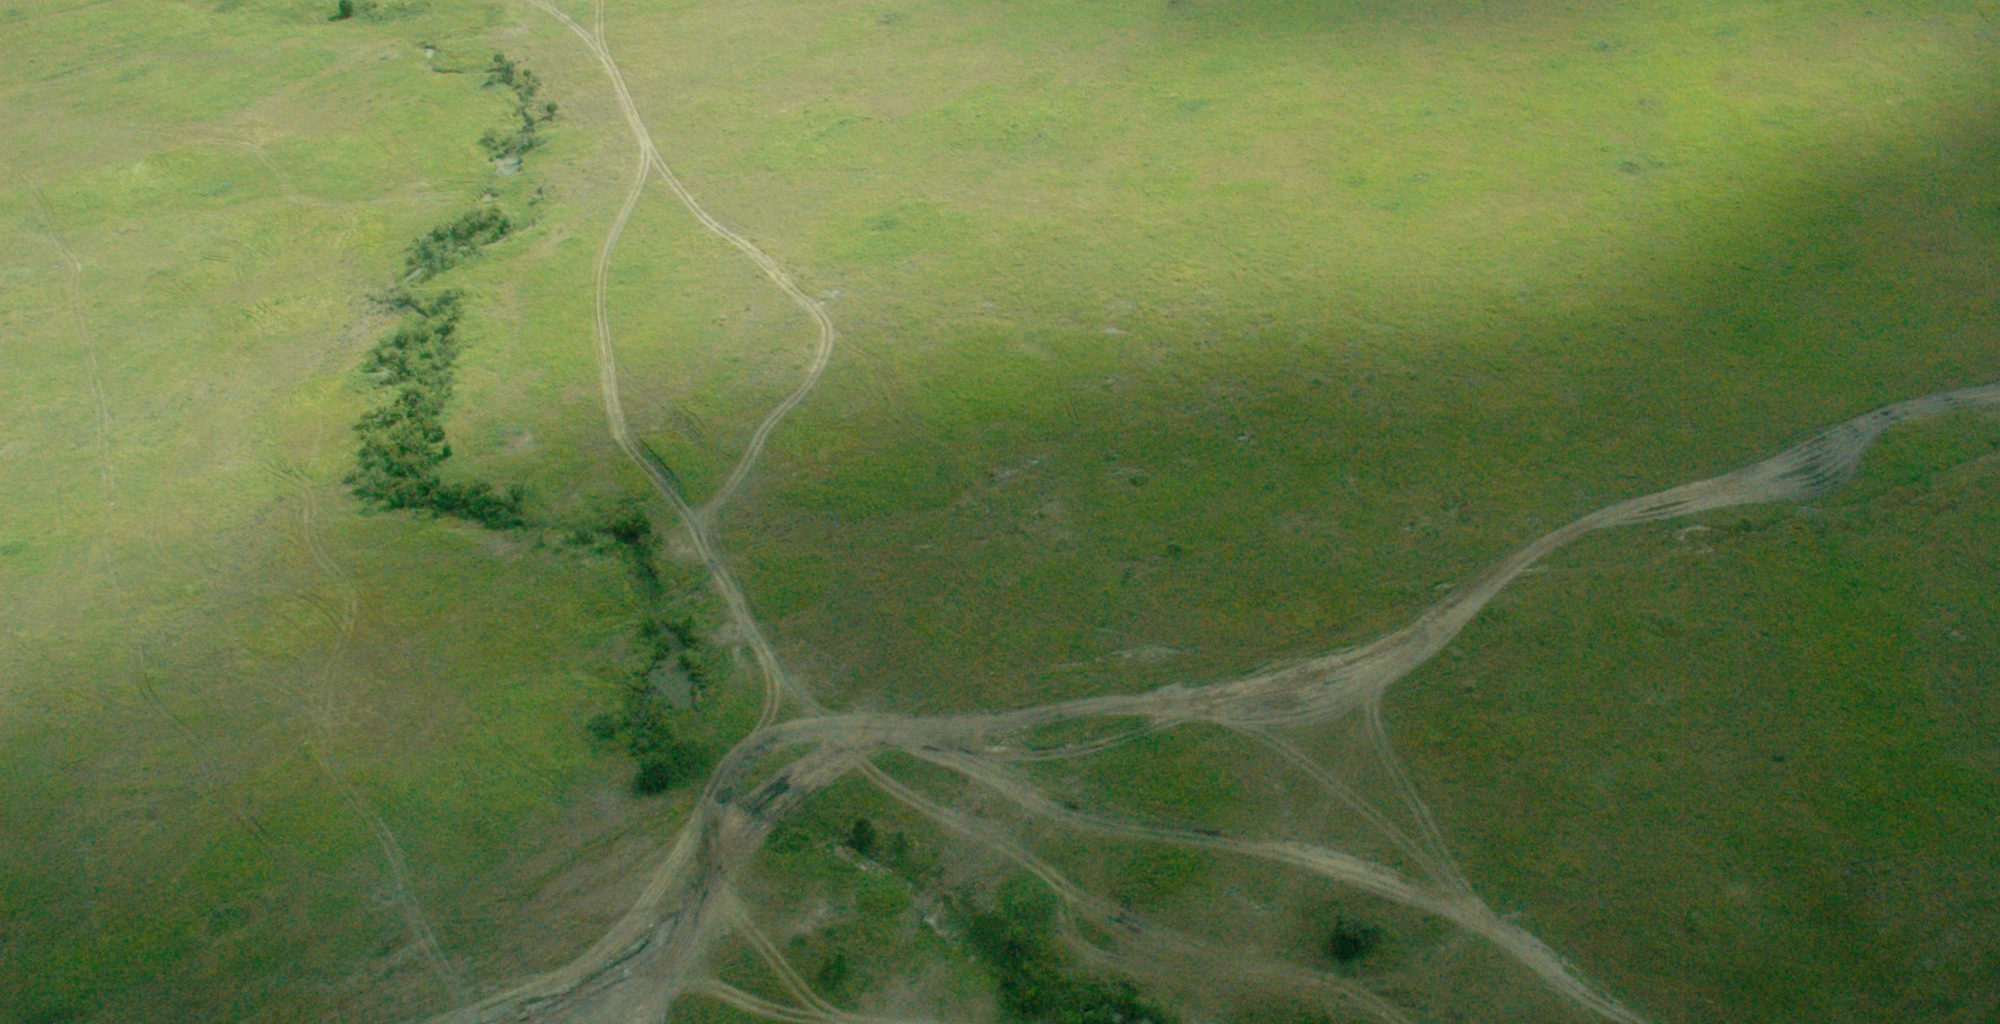 Great Rift Valley Kenya Aerial